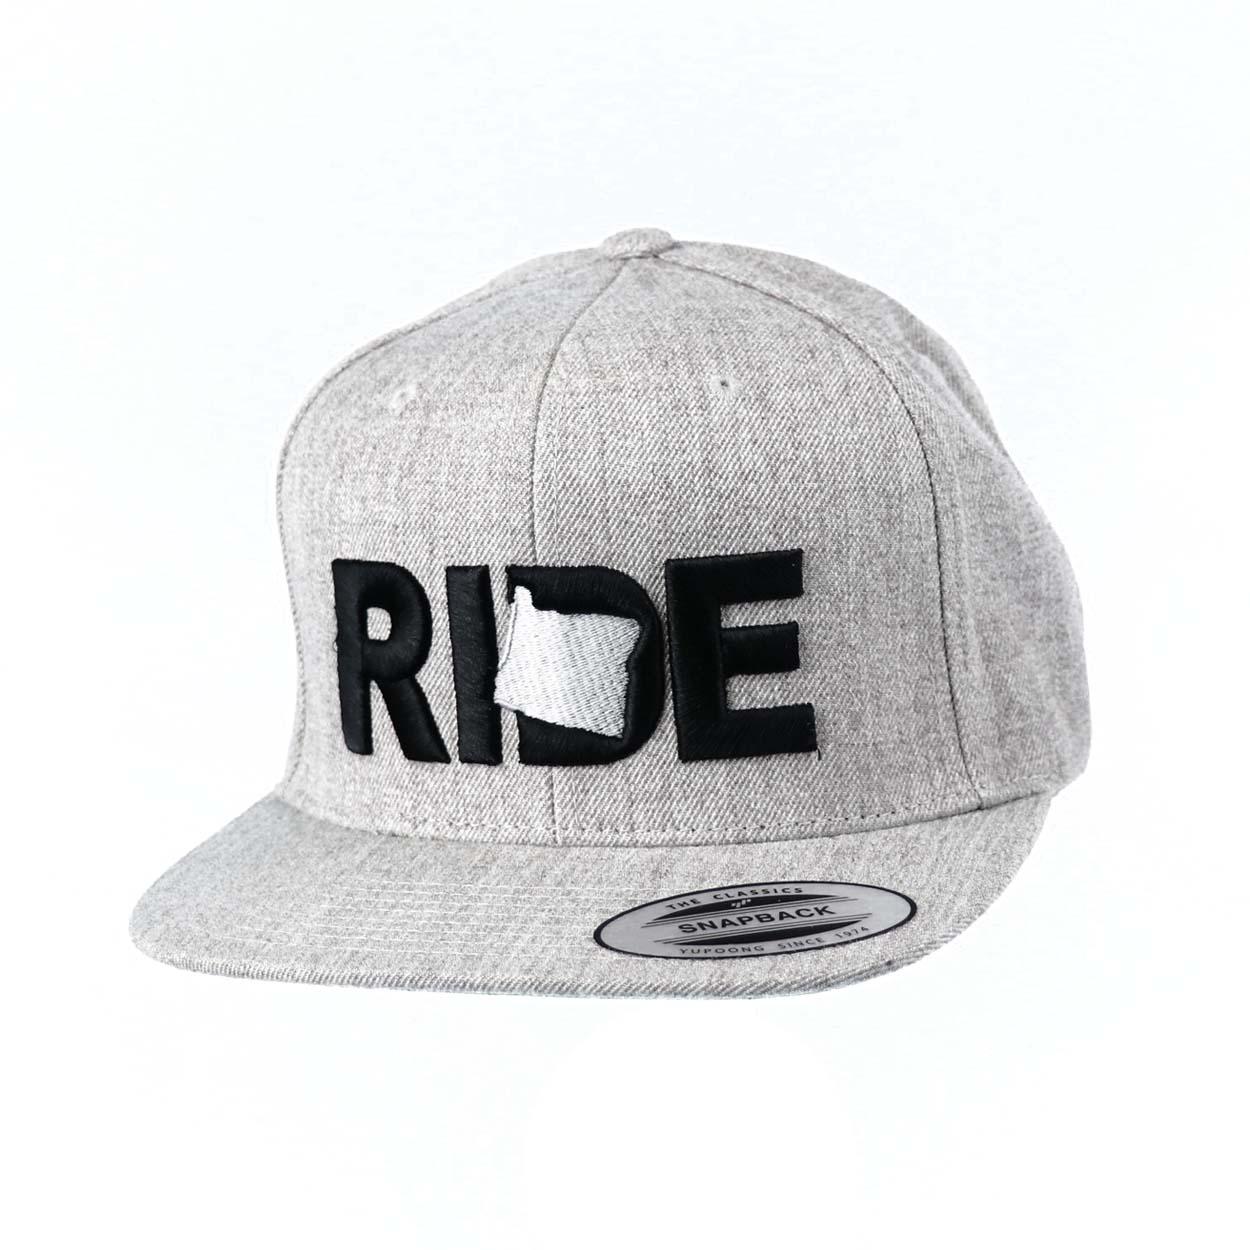 Ride Oregon Classic Embroidered  Snapback Flat Brim Hat Gray/Black